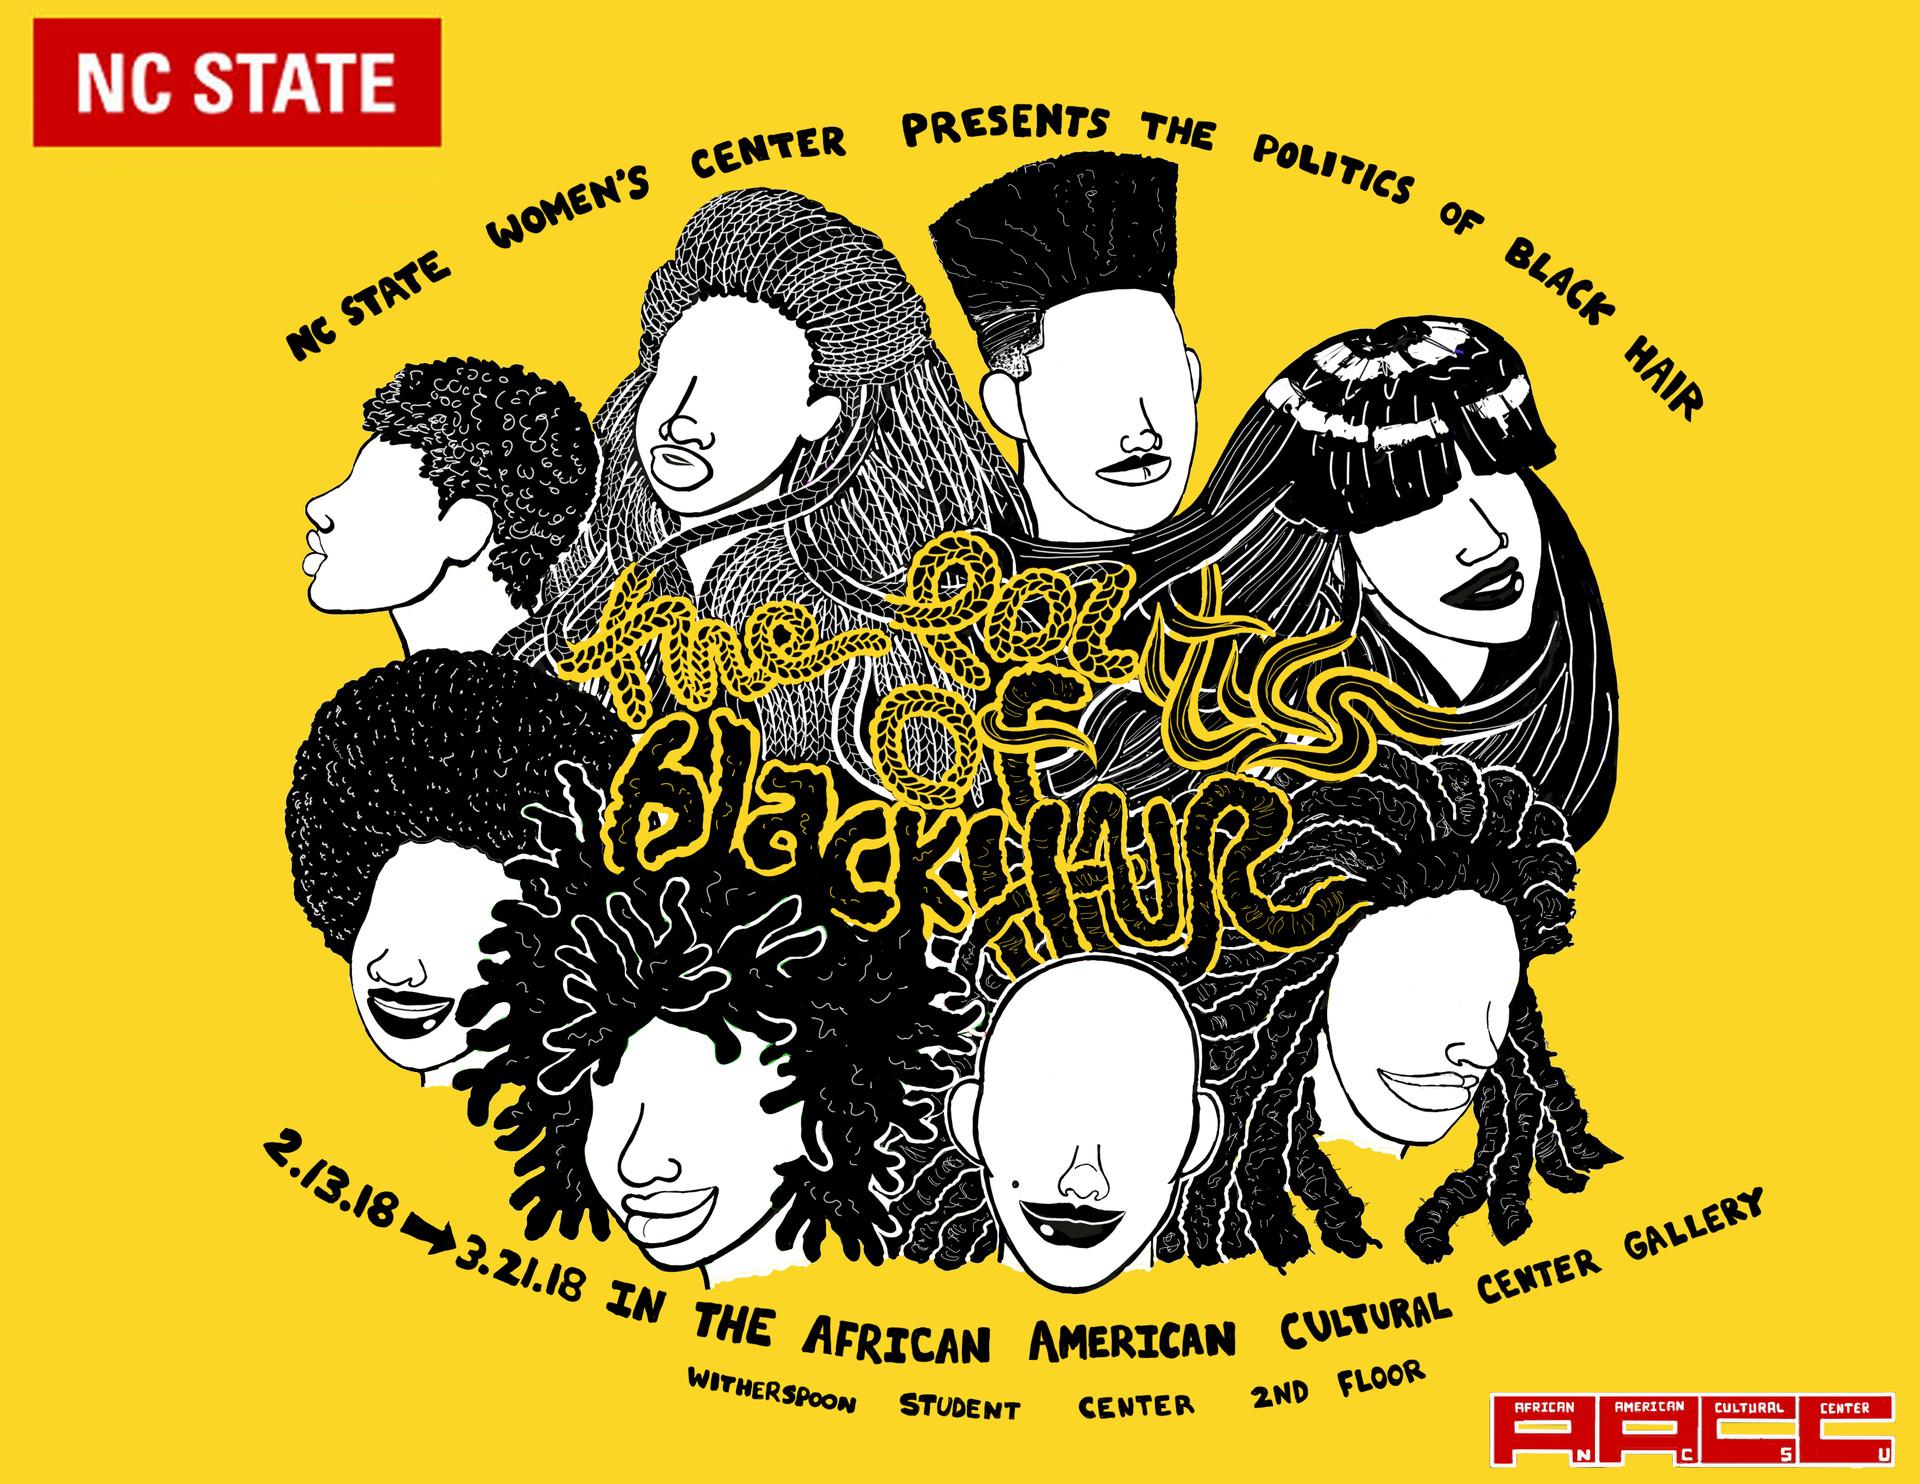 The Politics of Black Hair